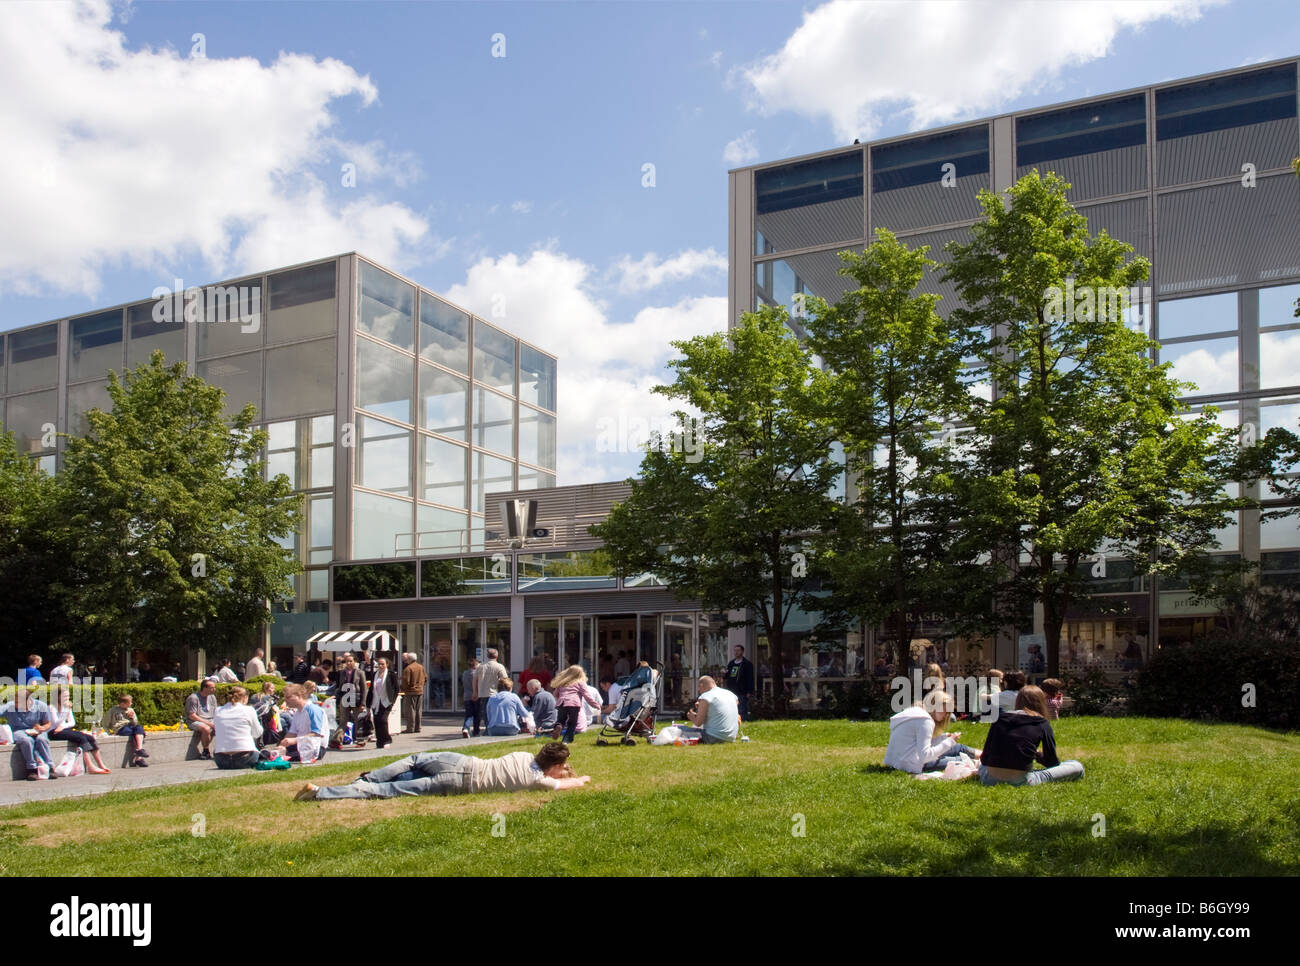 The thecentre:mk Shopping Centre - Milton Keynes - Buckinghamshire - Stock Image